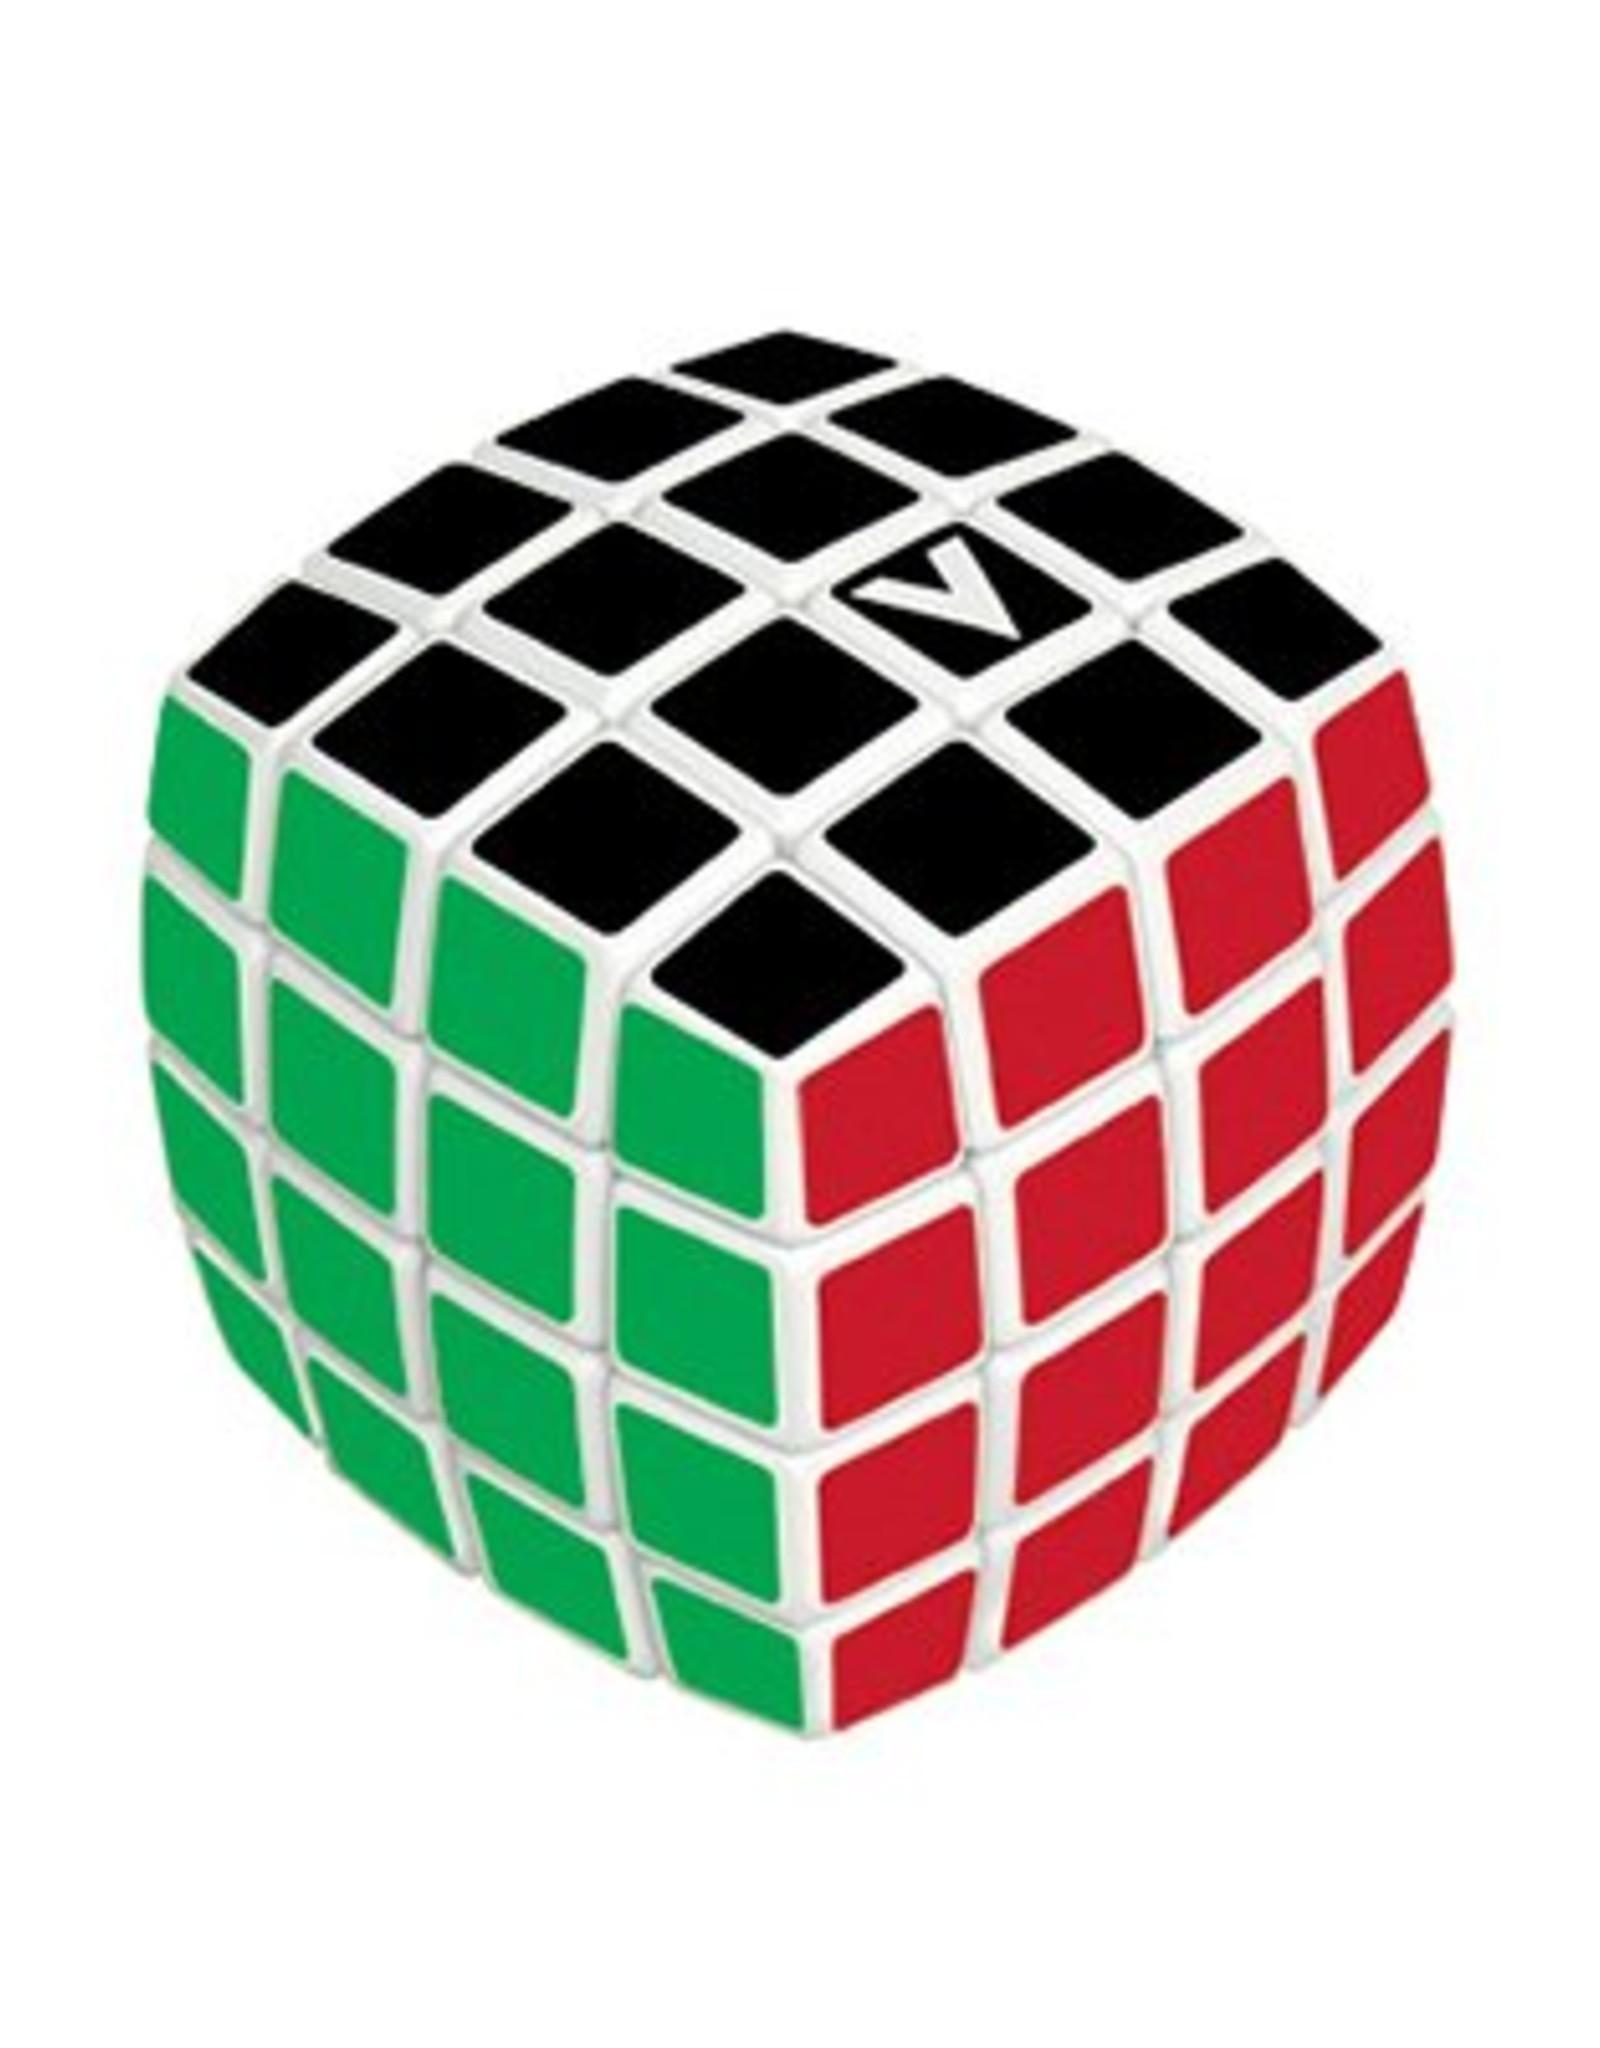 V-cube 4b Pillowed Cube